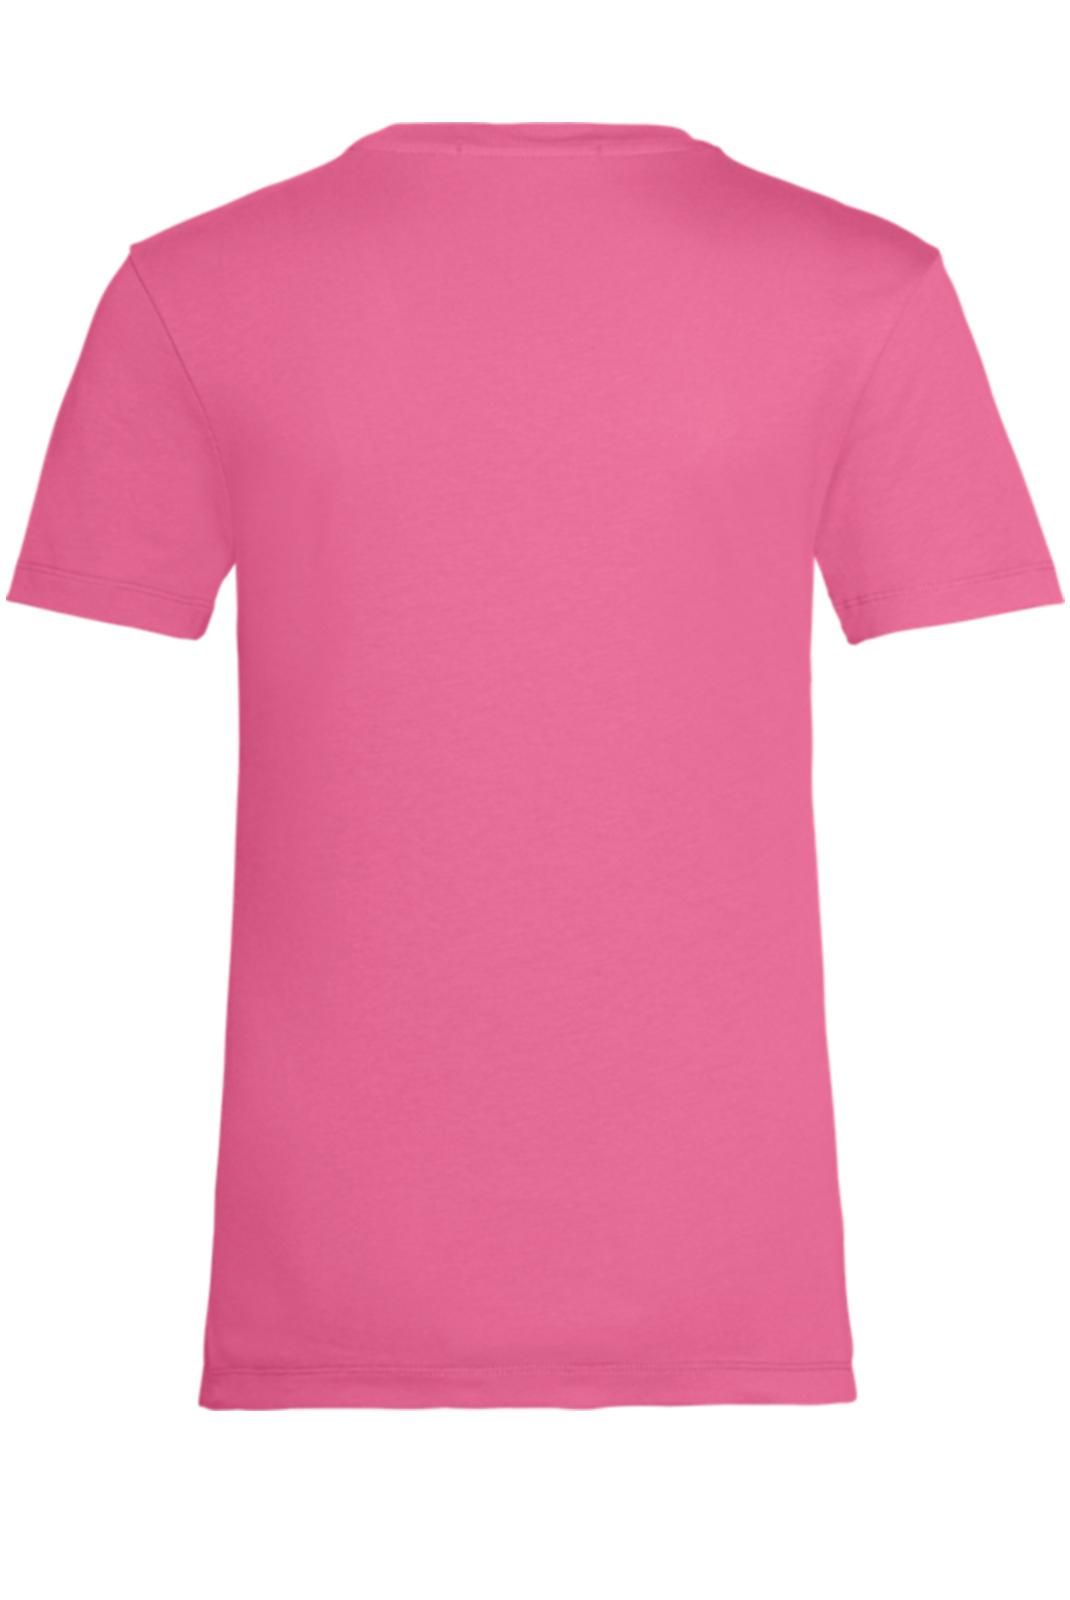 Tee shirt  Calvin klein J20J213183 VGY RASPBERRY SORBET